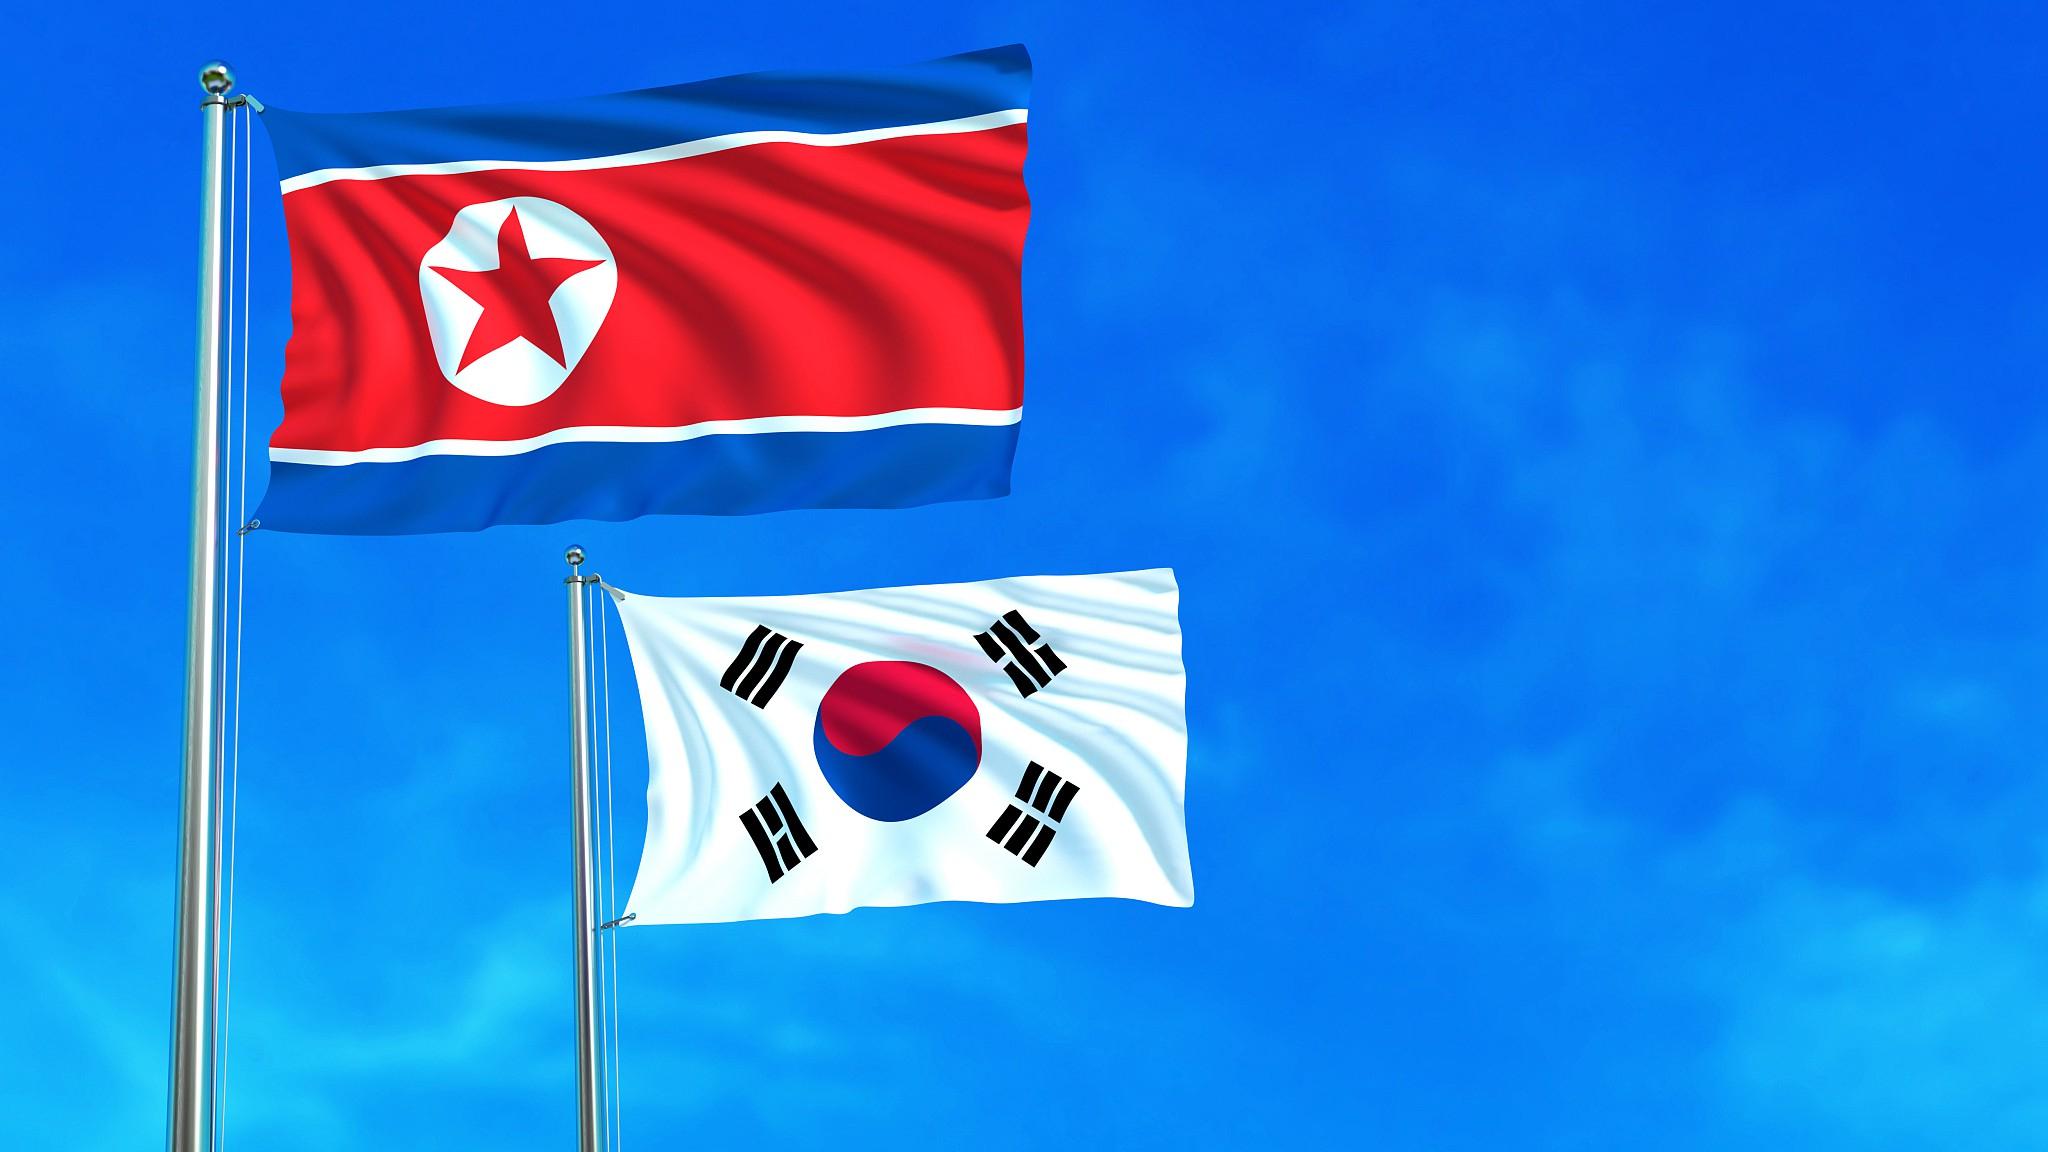 Wang Peng: ROK stops calling DPRK 'ENEMY'-Charhar Institute